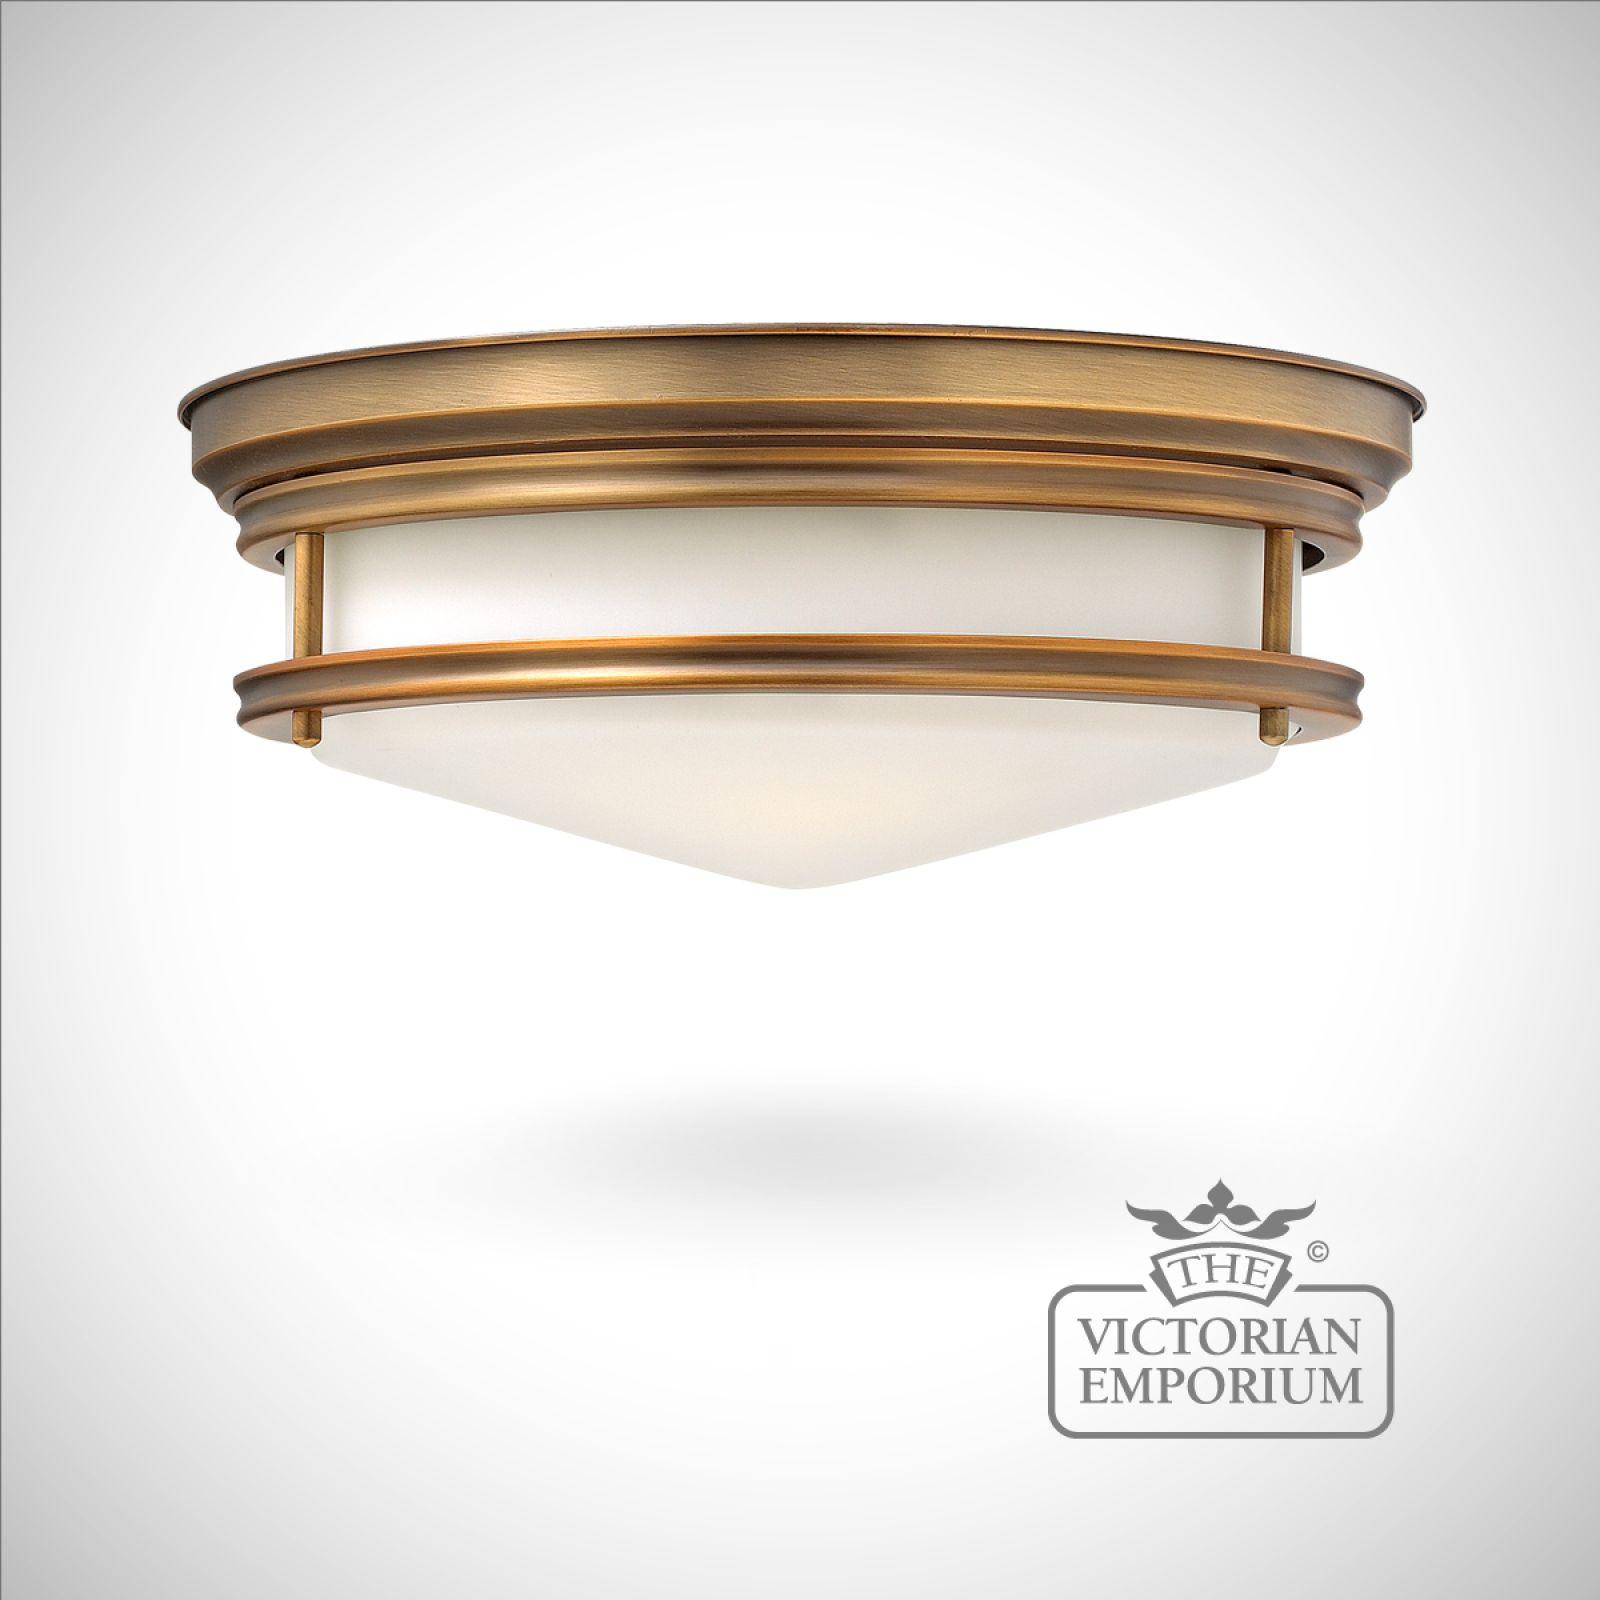 metallic pendant lighting design discoveries. Metallic Pendant Lighting Design Discoveries